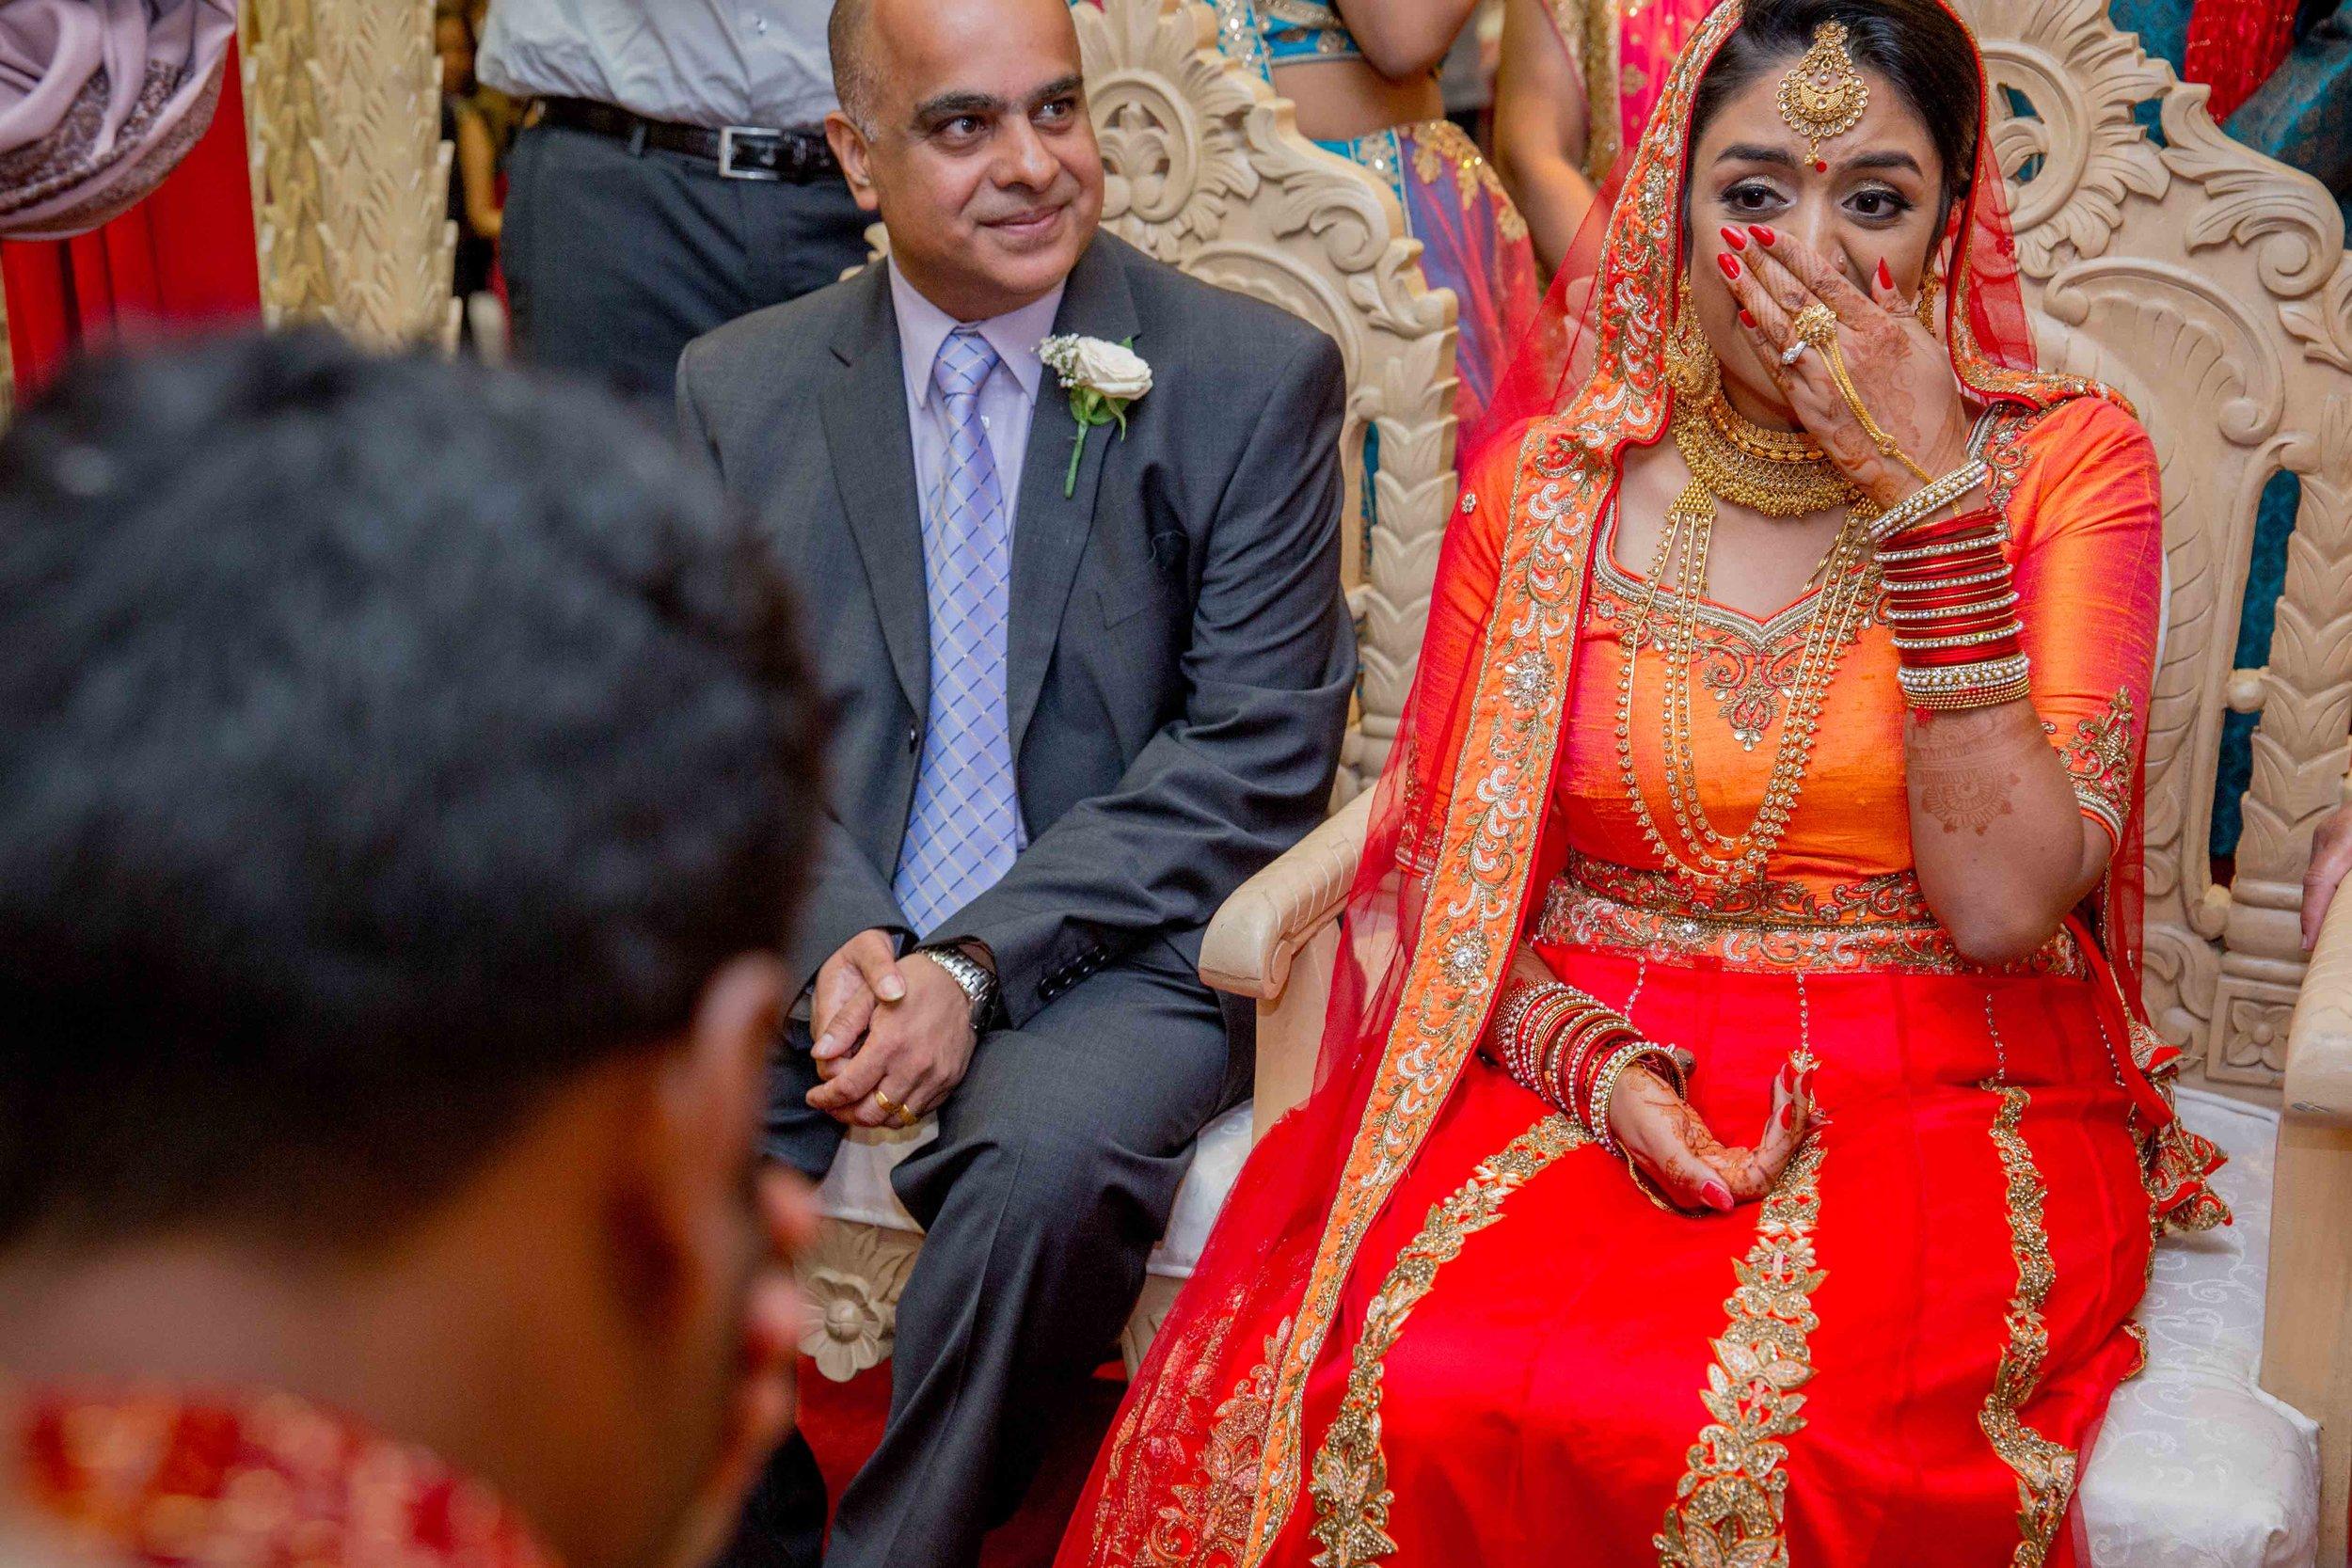 premier-banquetting-london-Hindu-asian-wedding-photographer-natalia-smith-photography-19.jpg